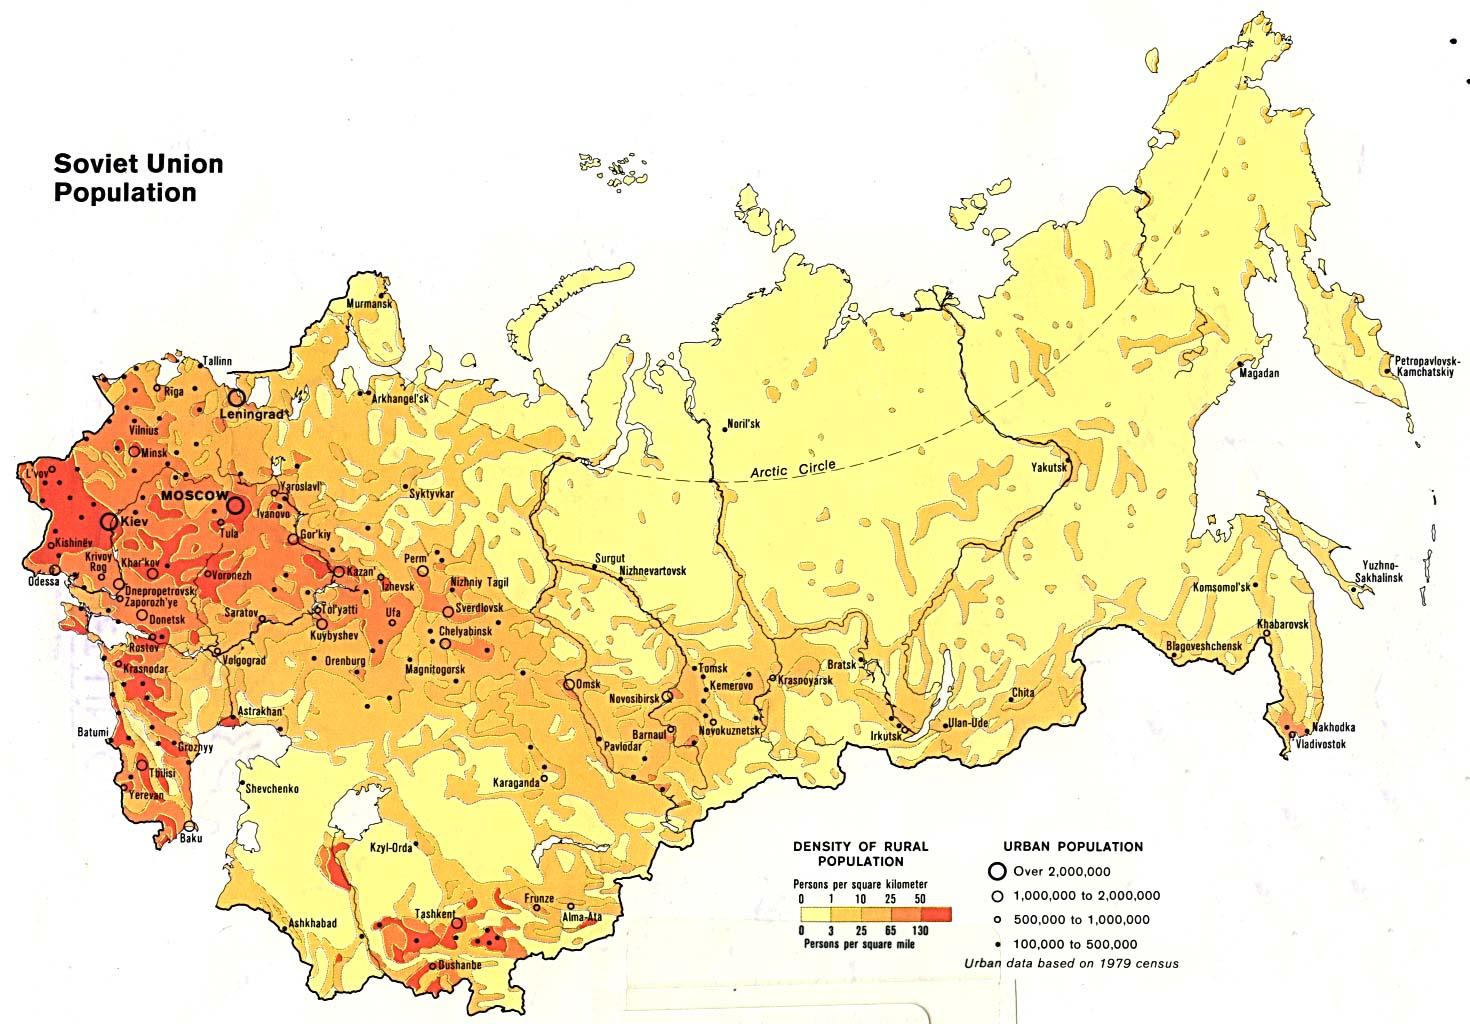 Mongolia Language Name Russian Population 49